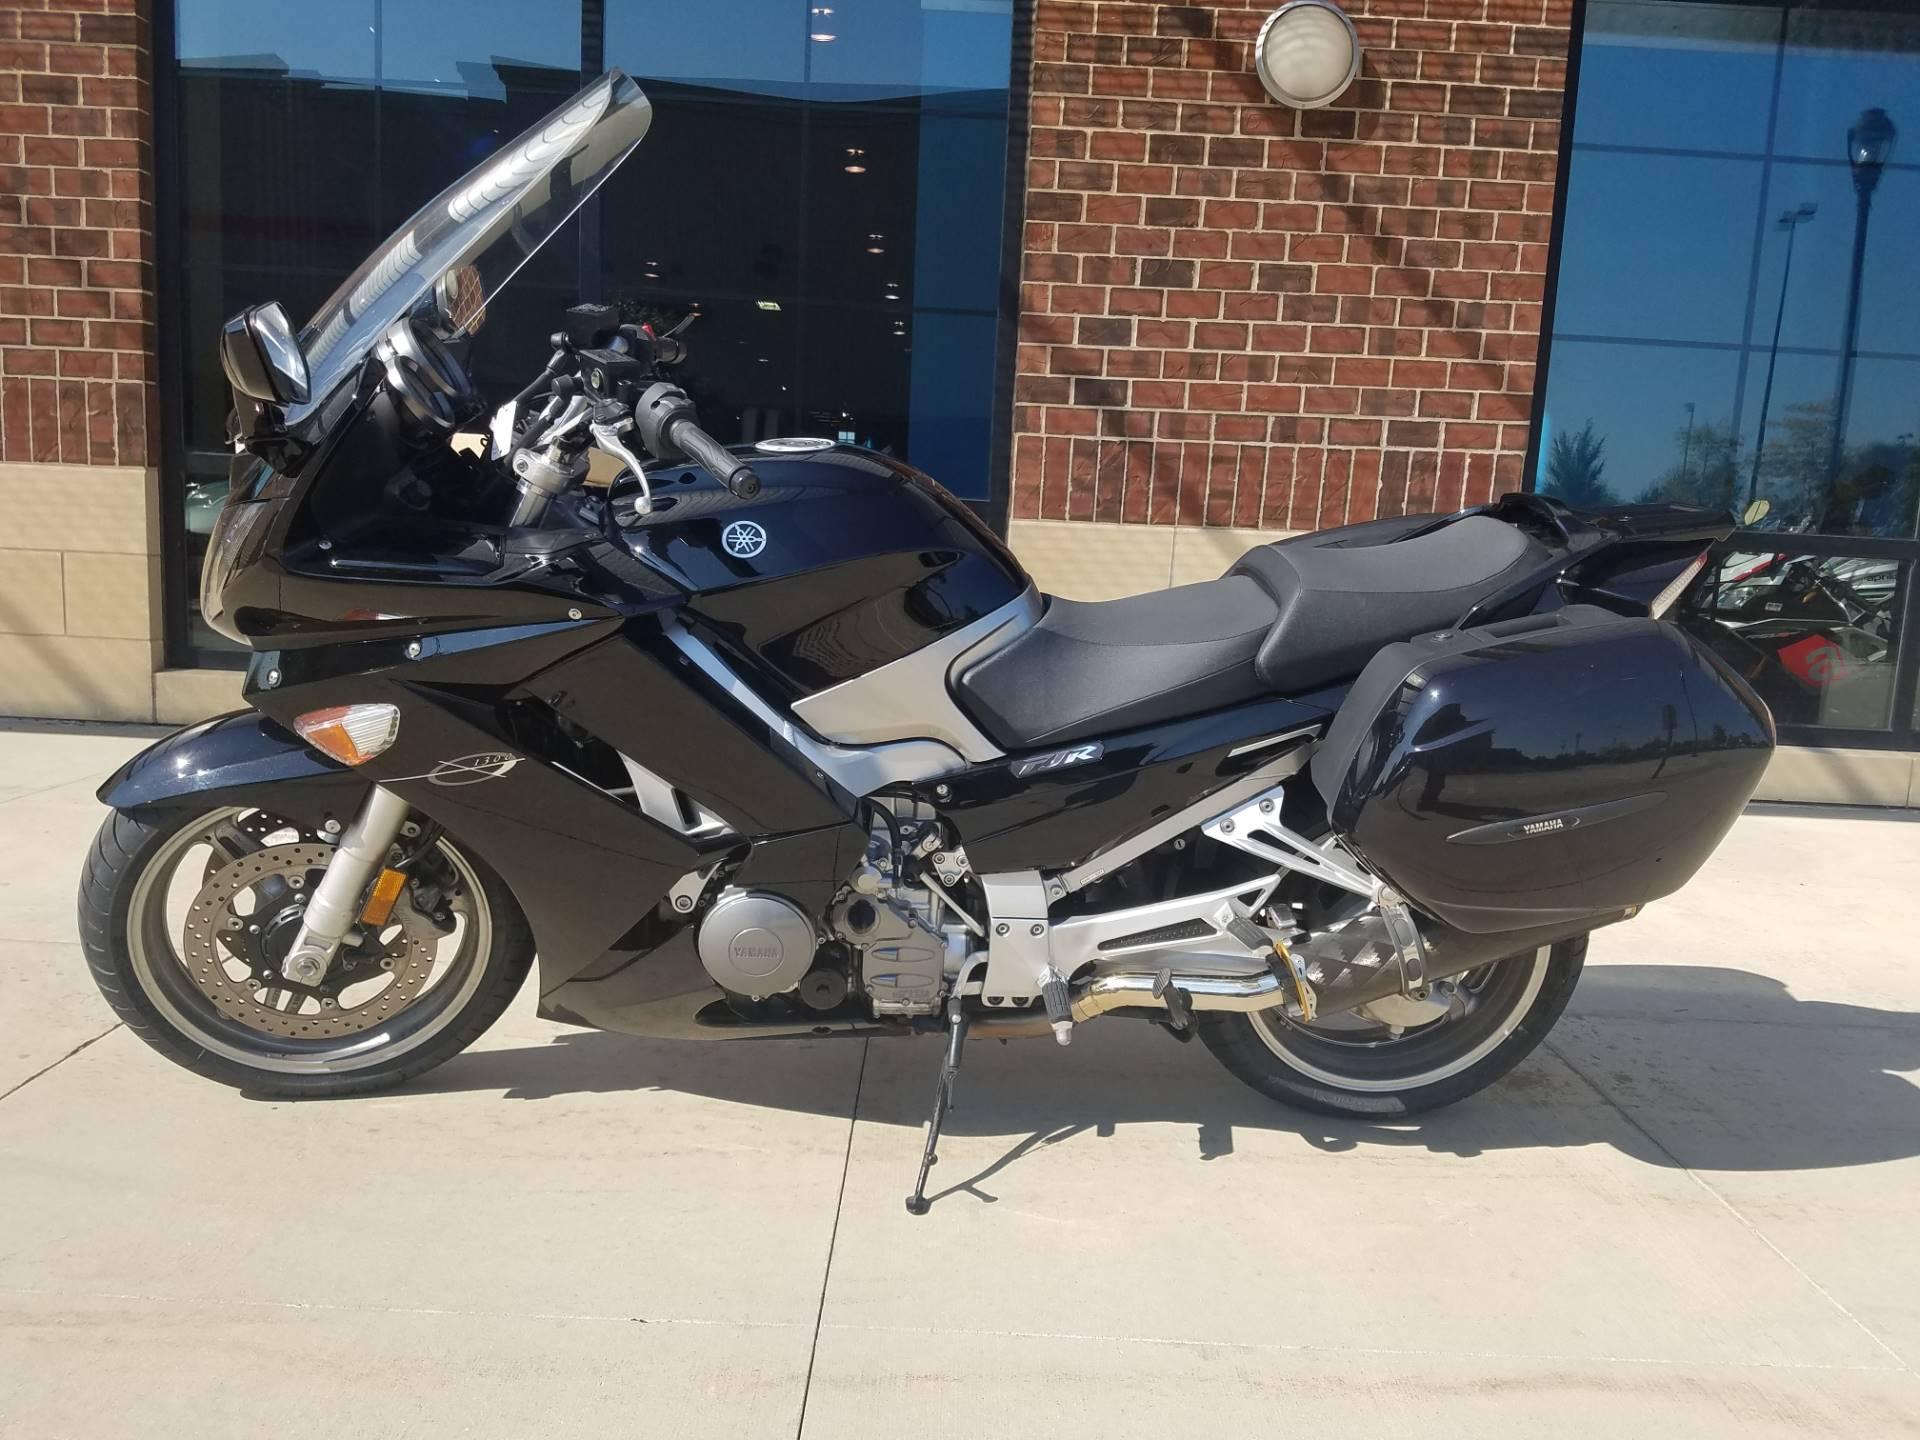 2008 Yamaha FJR1300A 2